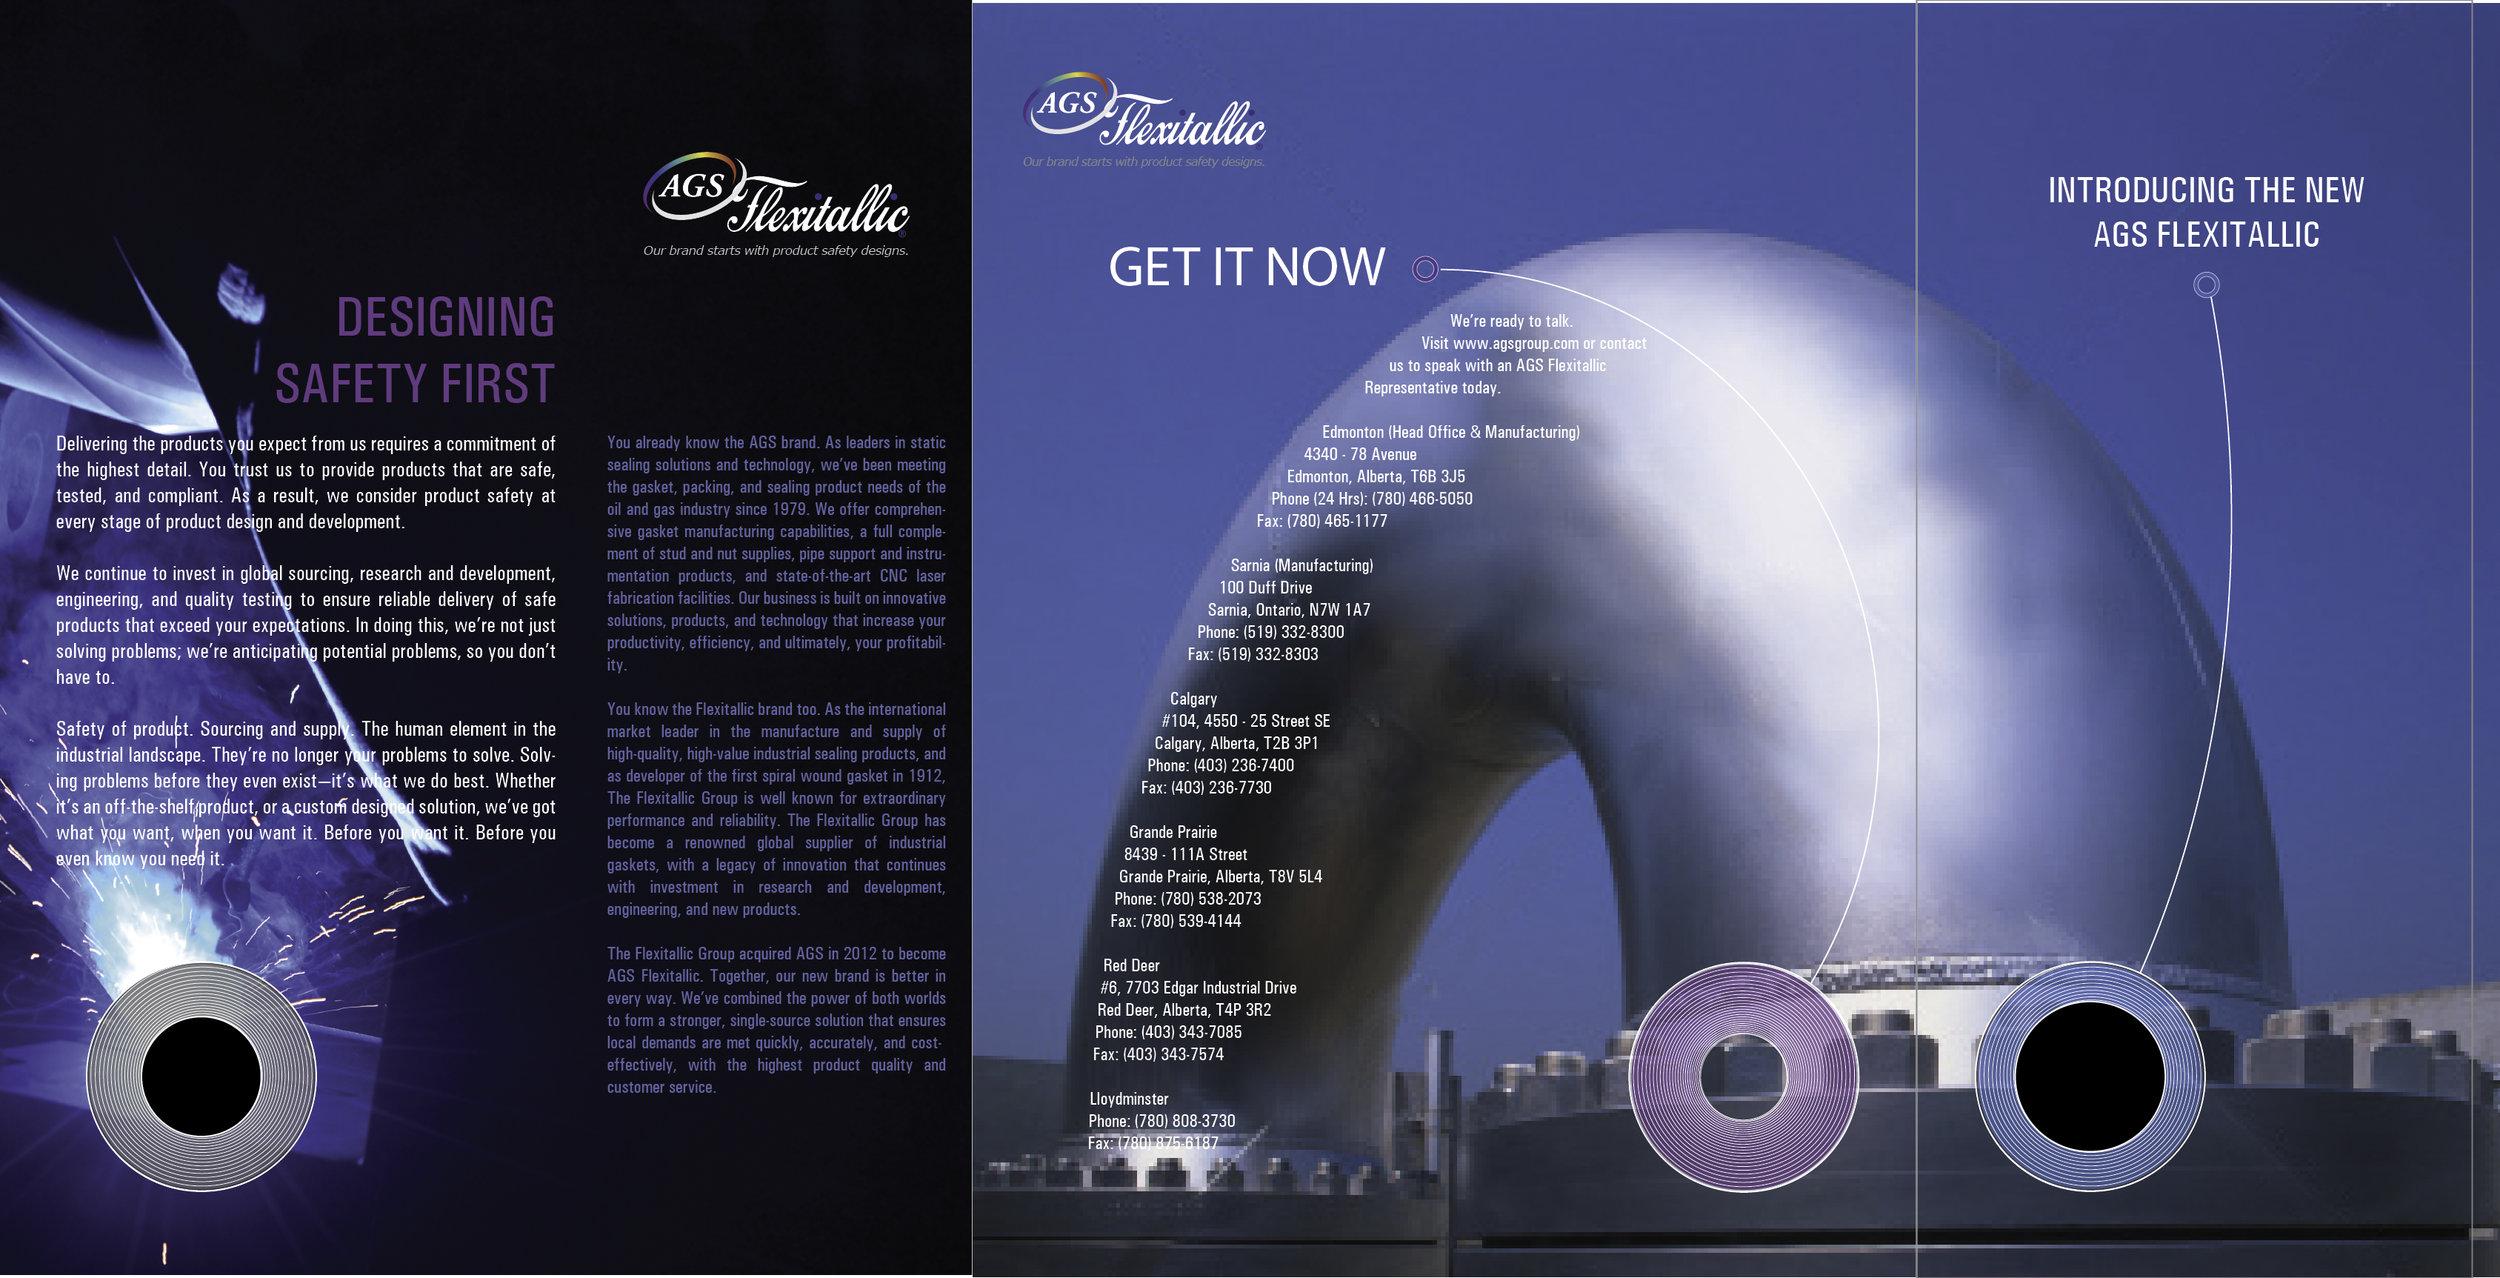 AGS Flexitallic Brochure_Outside Spread.jpg